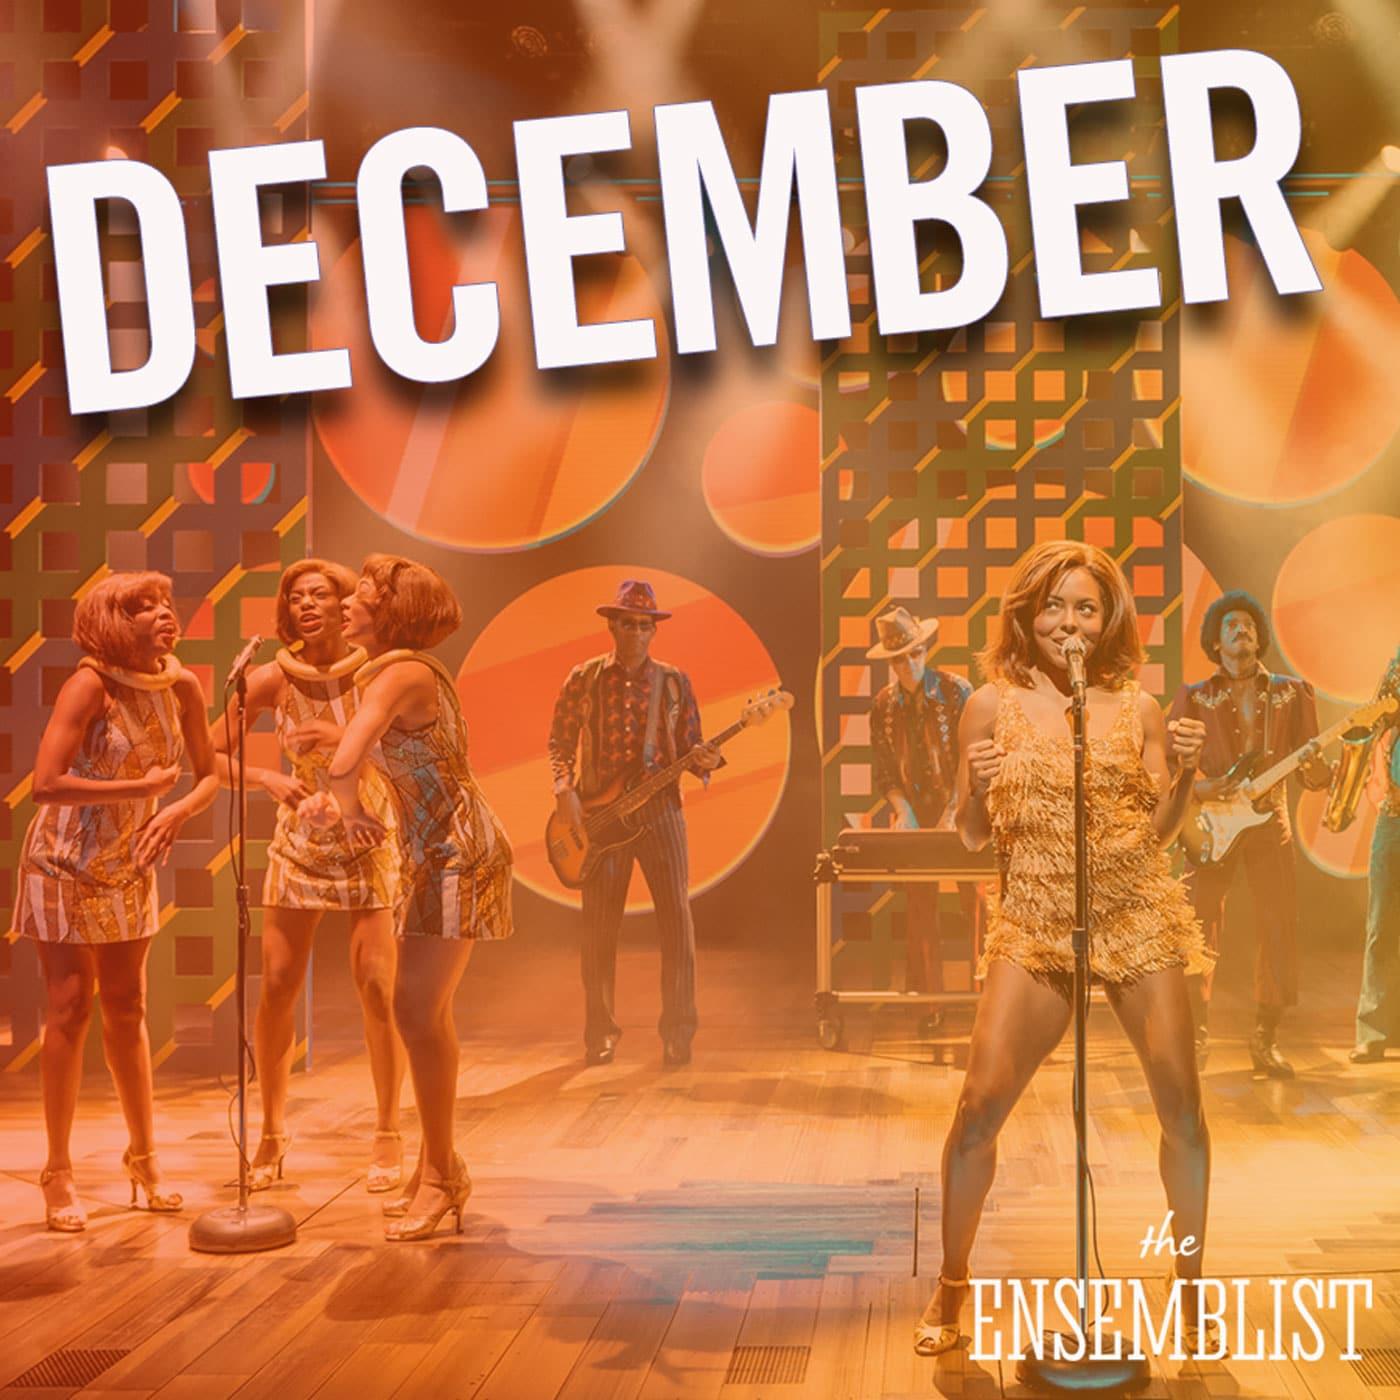 The Ensemblist host Mo Brady Episode 214 December